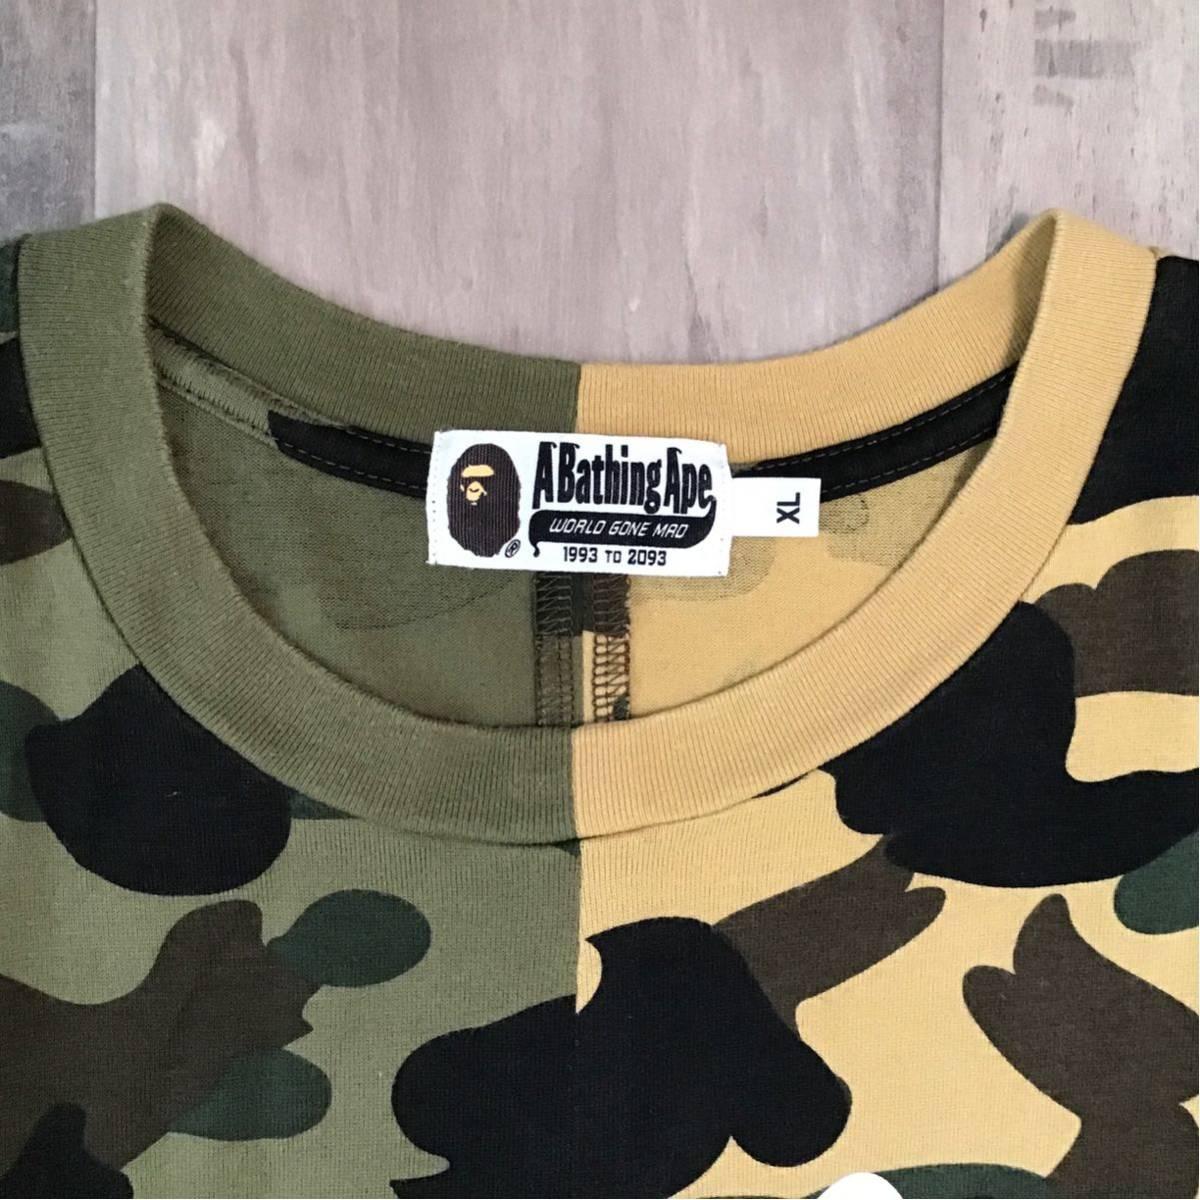 ★XL★ 1st camo half シャーク Tシャツ a bathing ape BAPE shark エイプ ベイプ アベイシングエイプ 迷彩 13mx